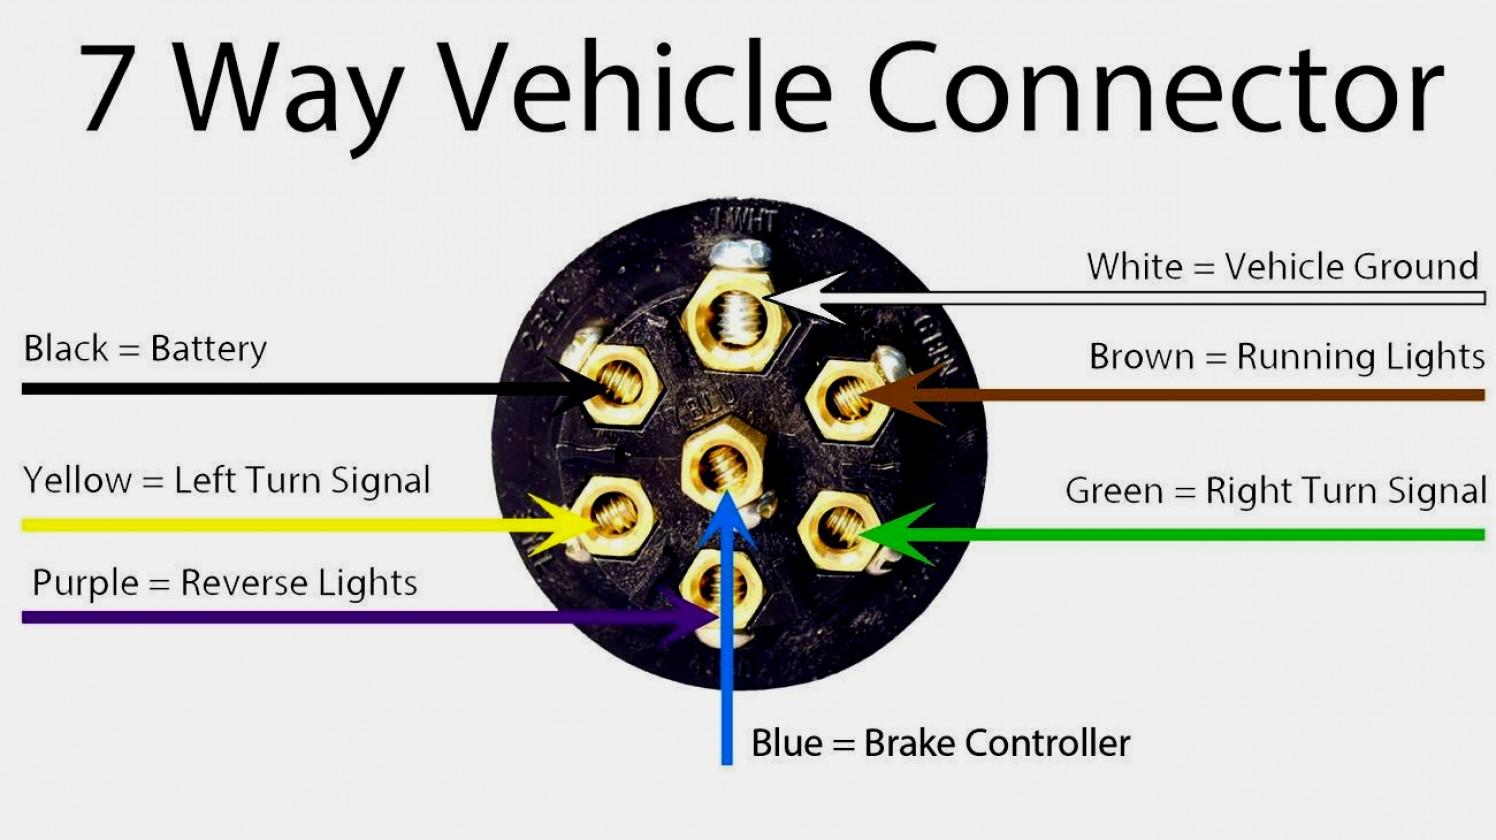 7 Prong Trailer Plug Wiring Diagram Blade Smart Diagrams - 6 Pin To 7 Pin Trailer Adapter Wiring Diagram